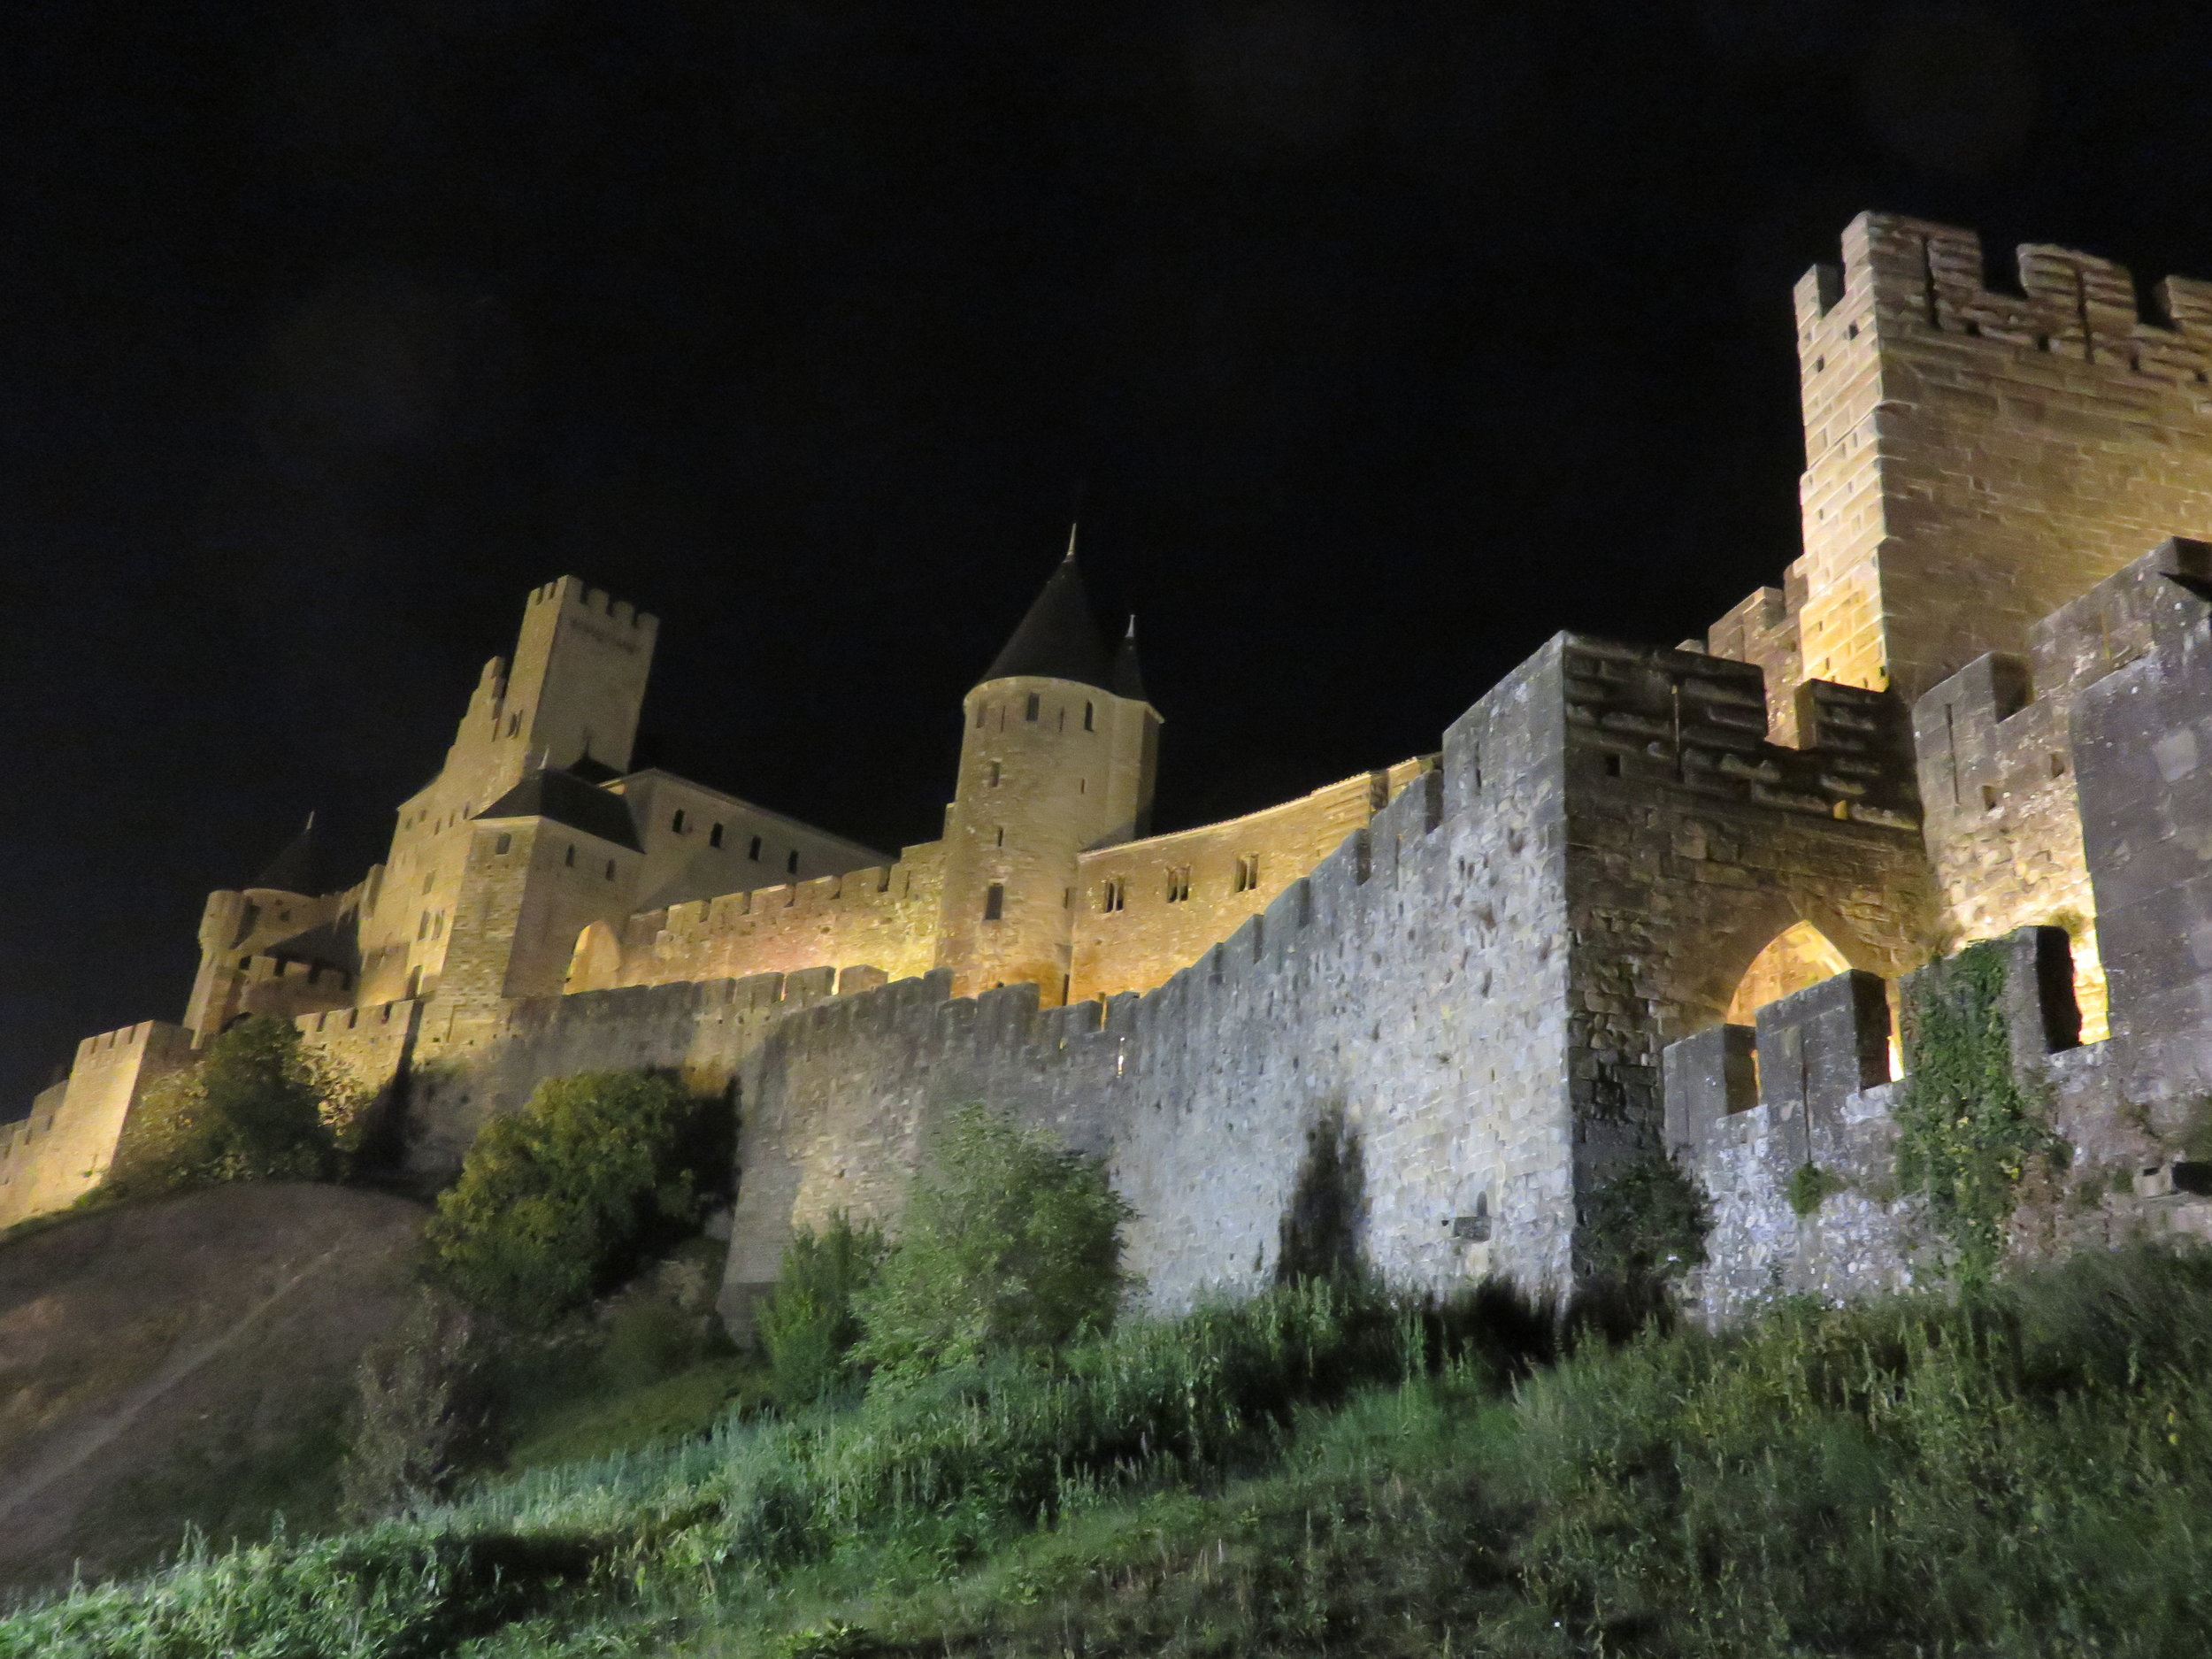 Hilltop castle-fortress at Carcassonne.